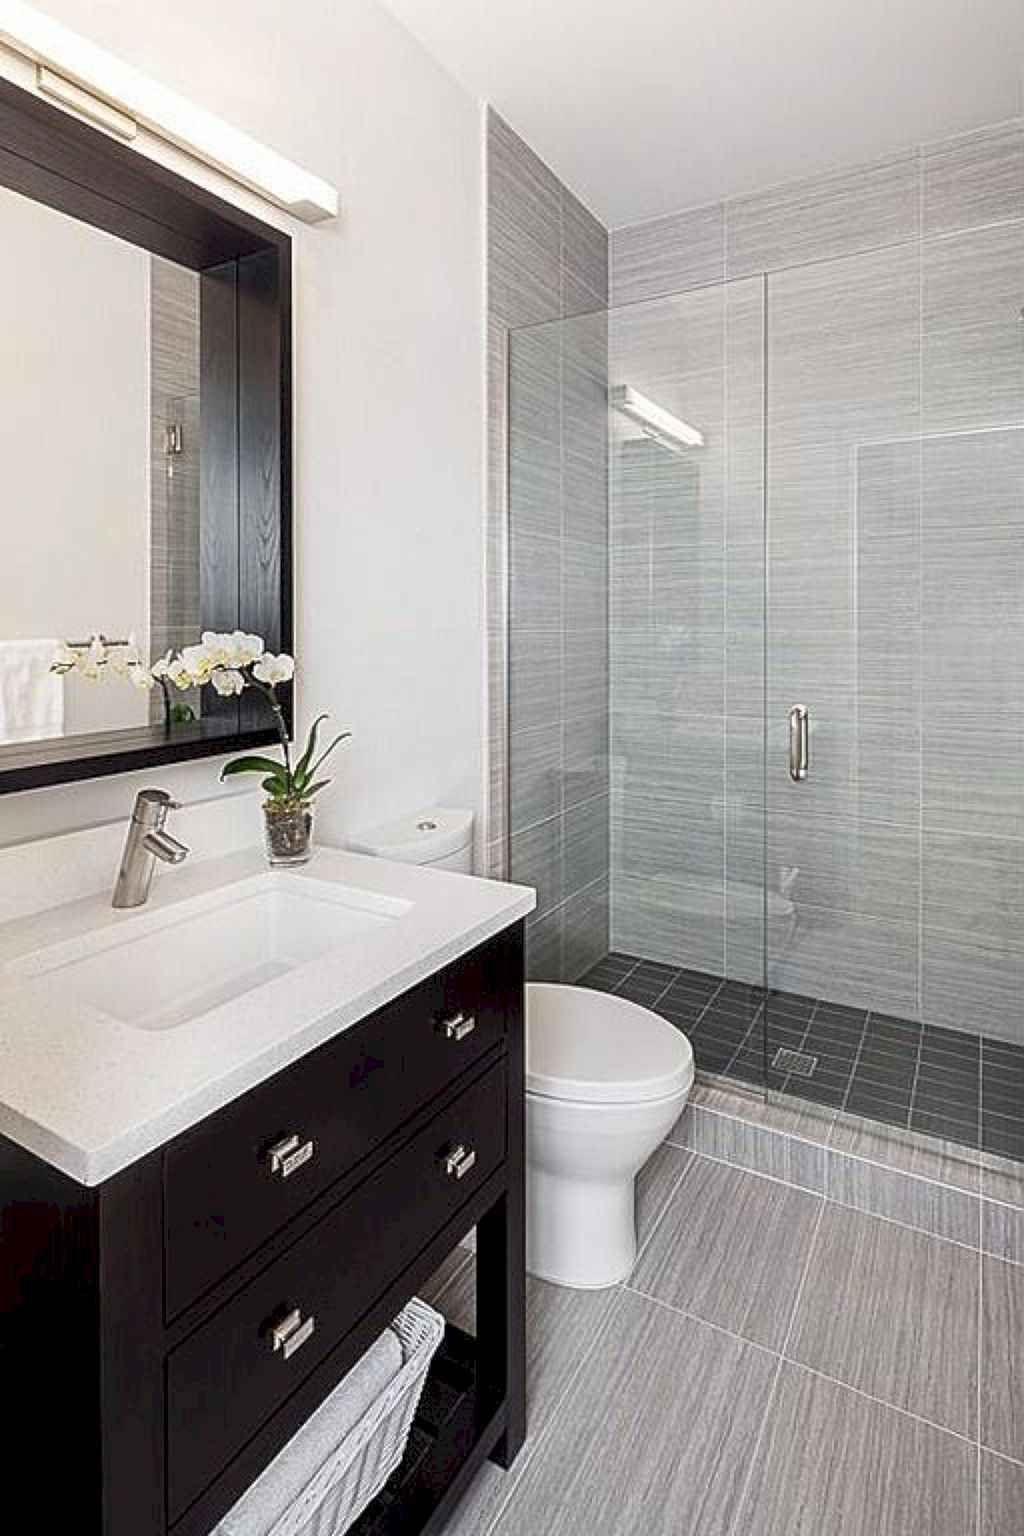 Awesome Small Bathroom Design Ideas 51 Bathroom Design Small Small Bathroom Small Grey Bathrooms